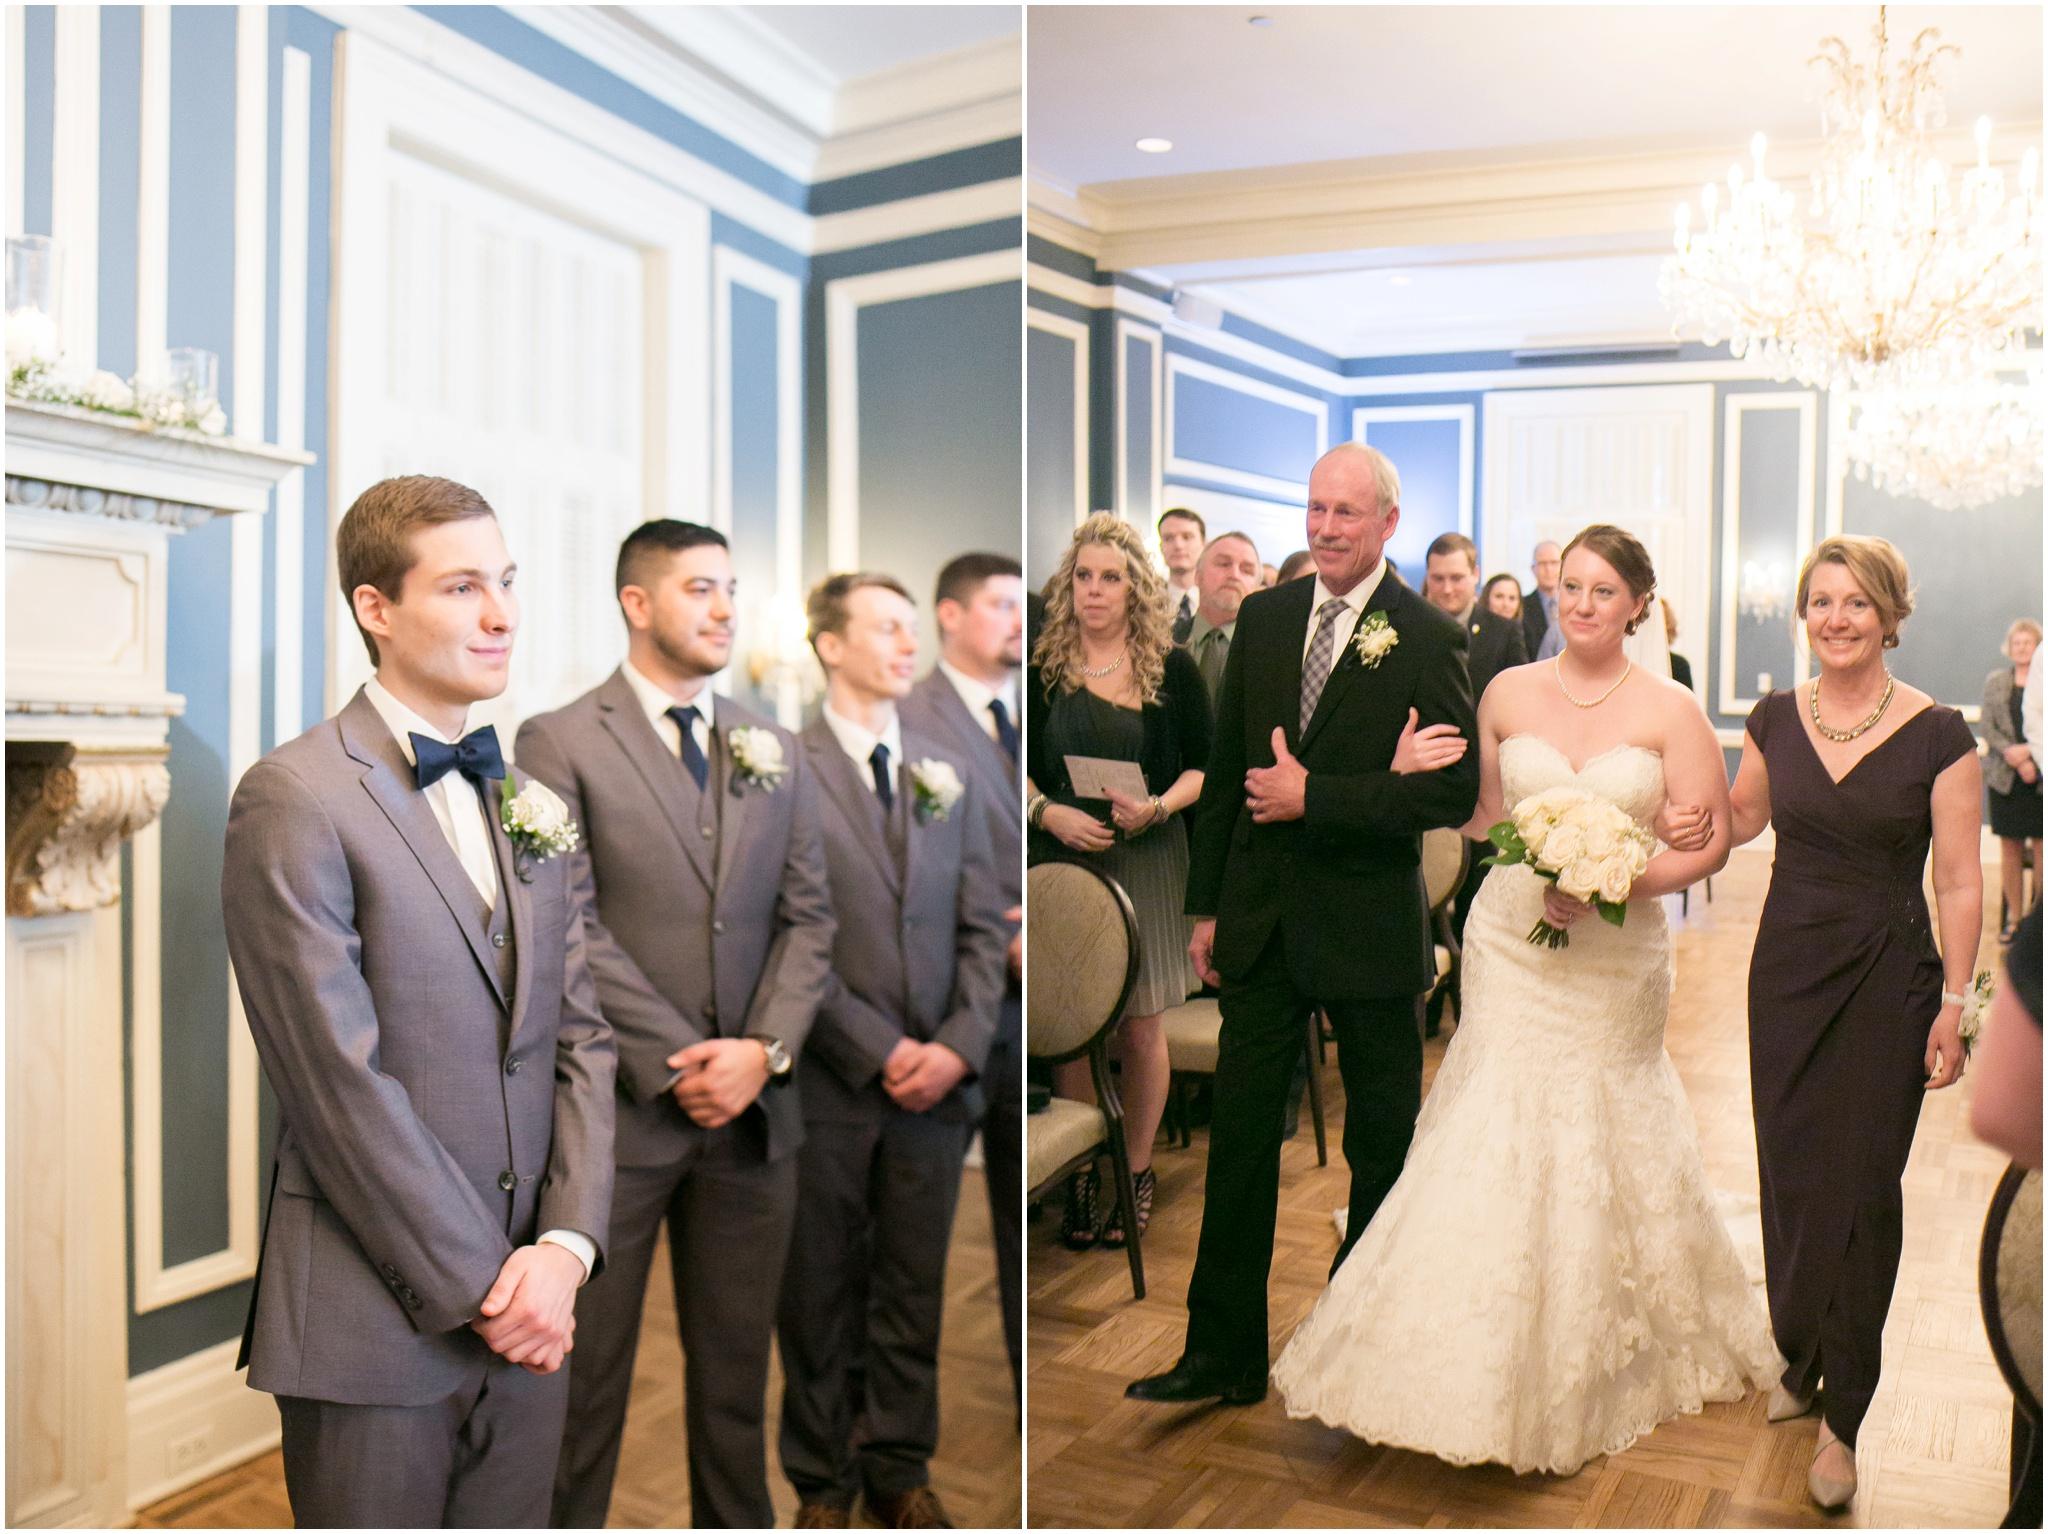 Madison_Club_Madison_Wisconsin_Wedding_Photographer_Spring_Rainy_Wedding_2648.jpg